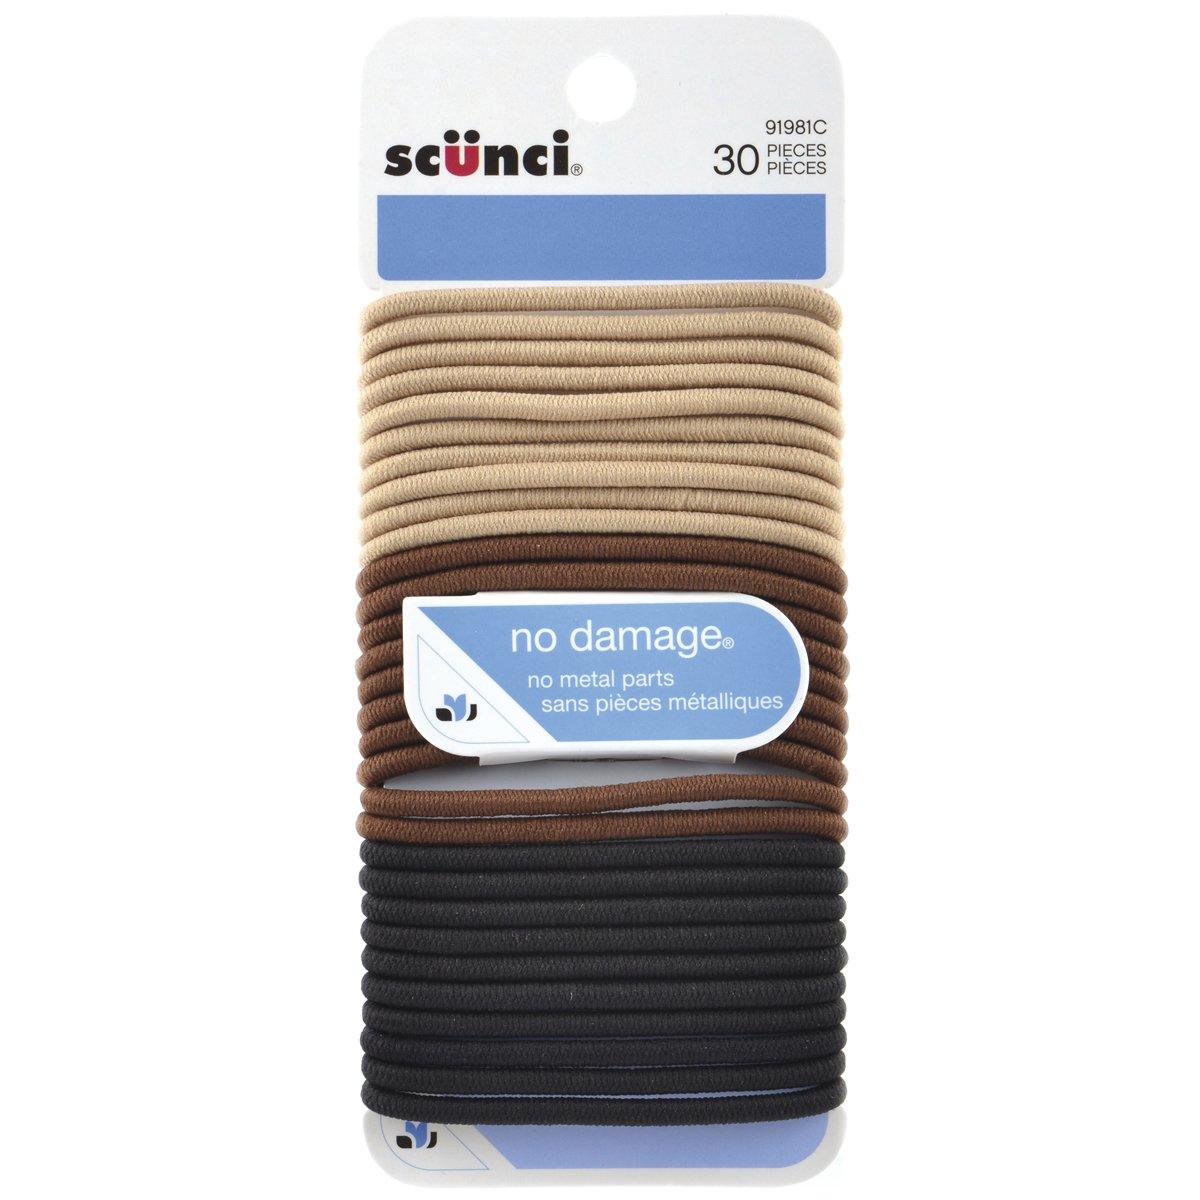 Conair Scunci 9198103a048c 30 Piece, 4 Millimeter, No-damage Elastics, Khaki, 1 Count Conair Consumer Products ULC